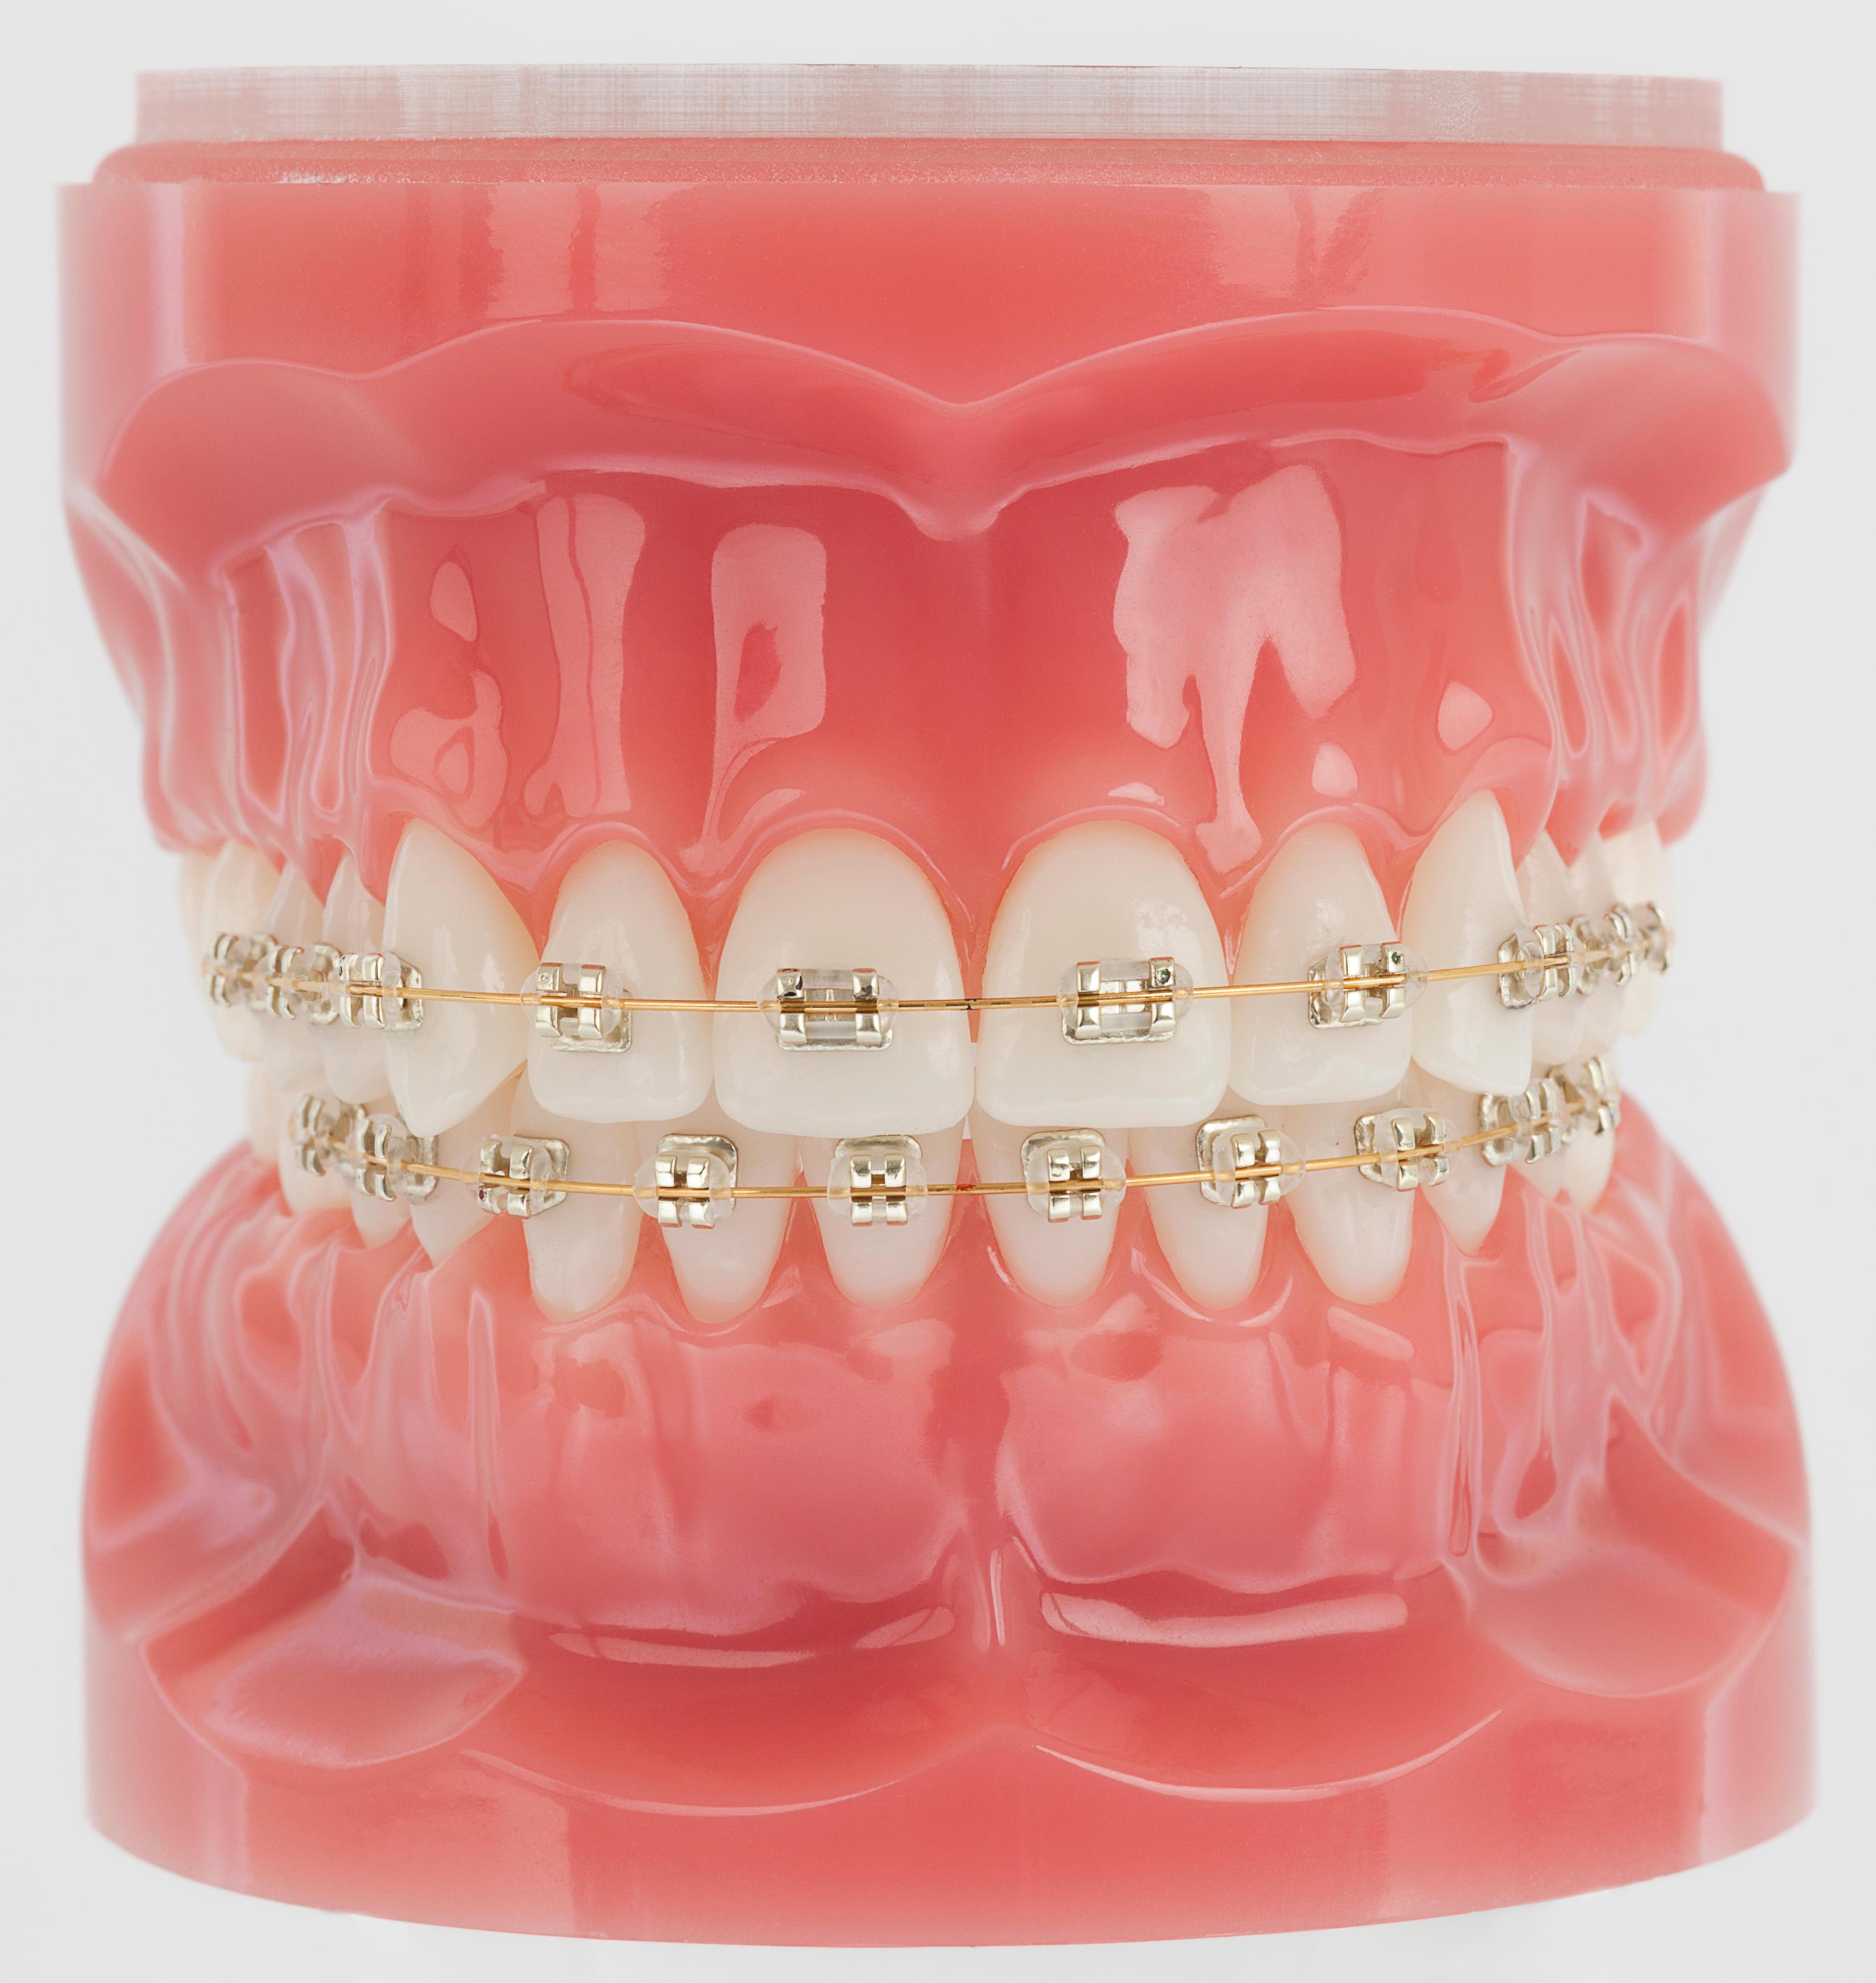 American Orthodontics Company Oukasfo